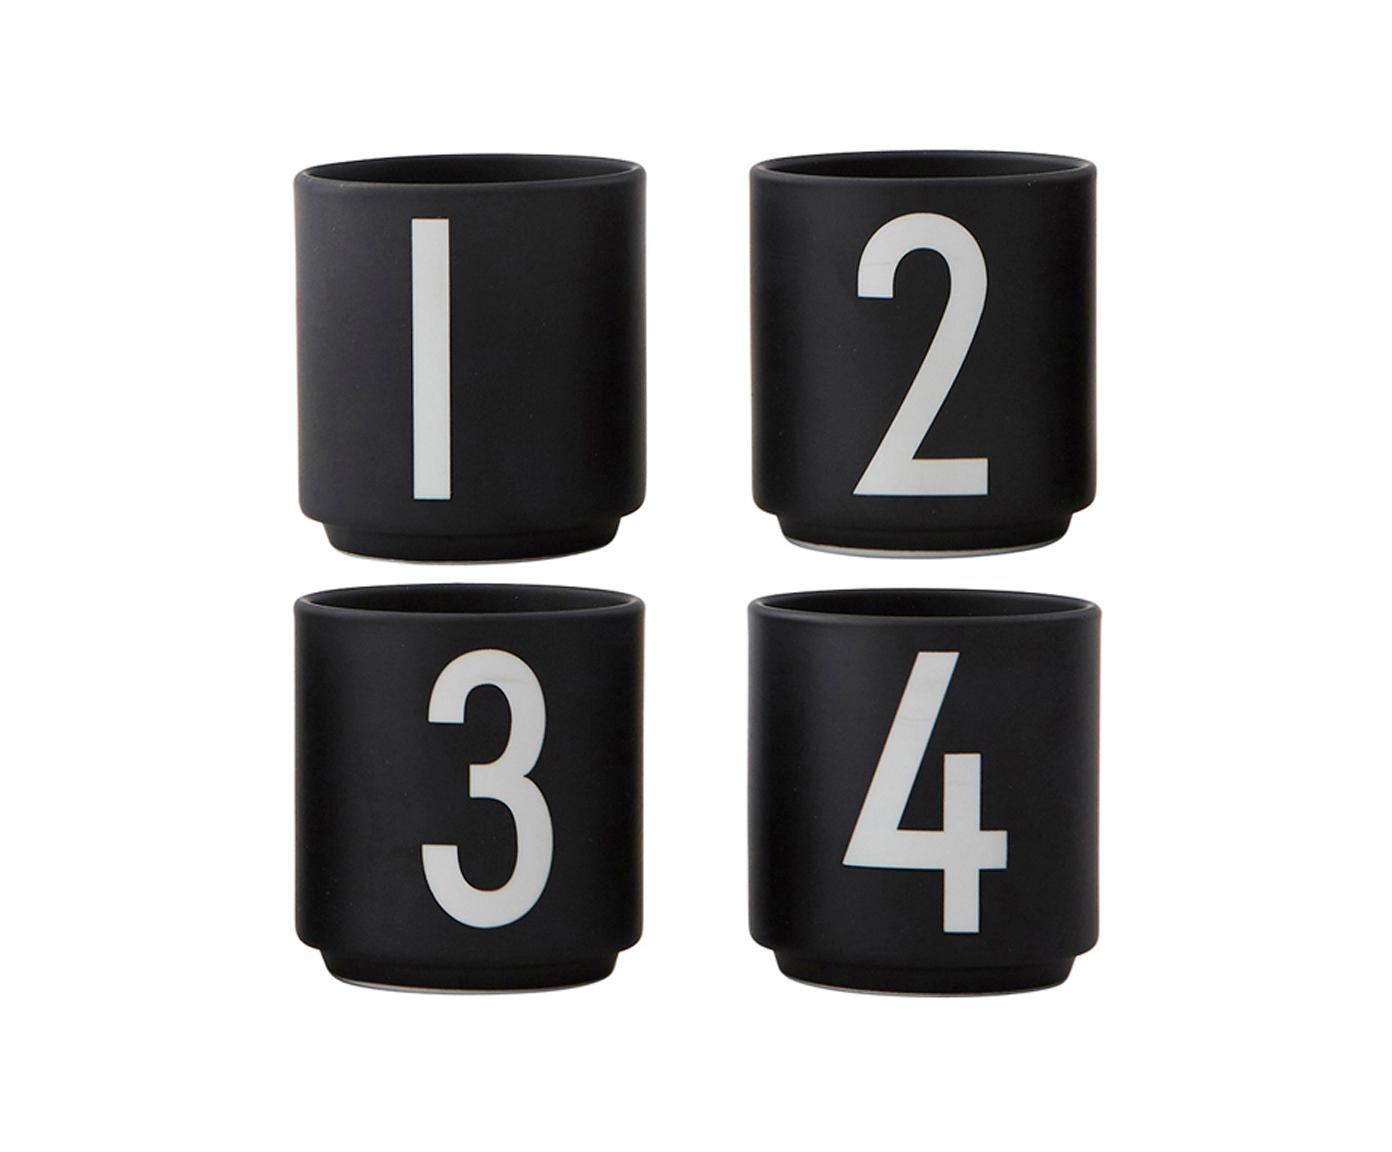 Set de tazas de café 1234, 4pzas., Porcelana fina, Negro, blanco, Ø 5 x Al 6 cm